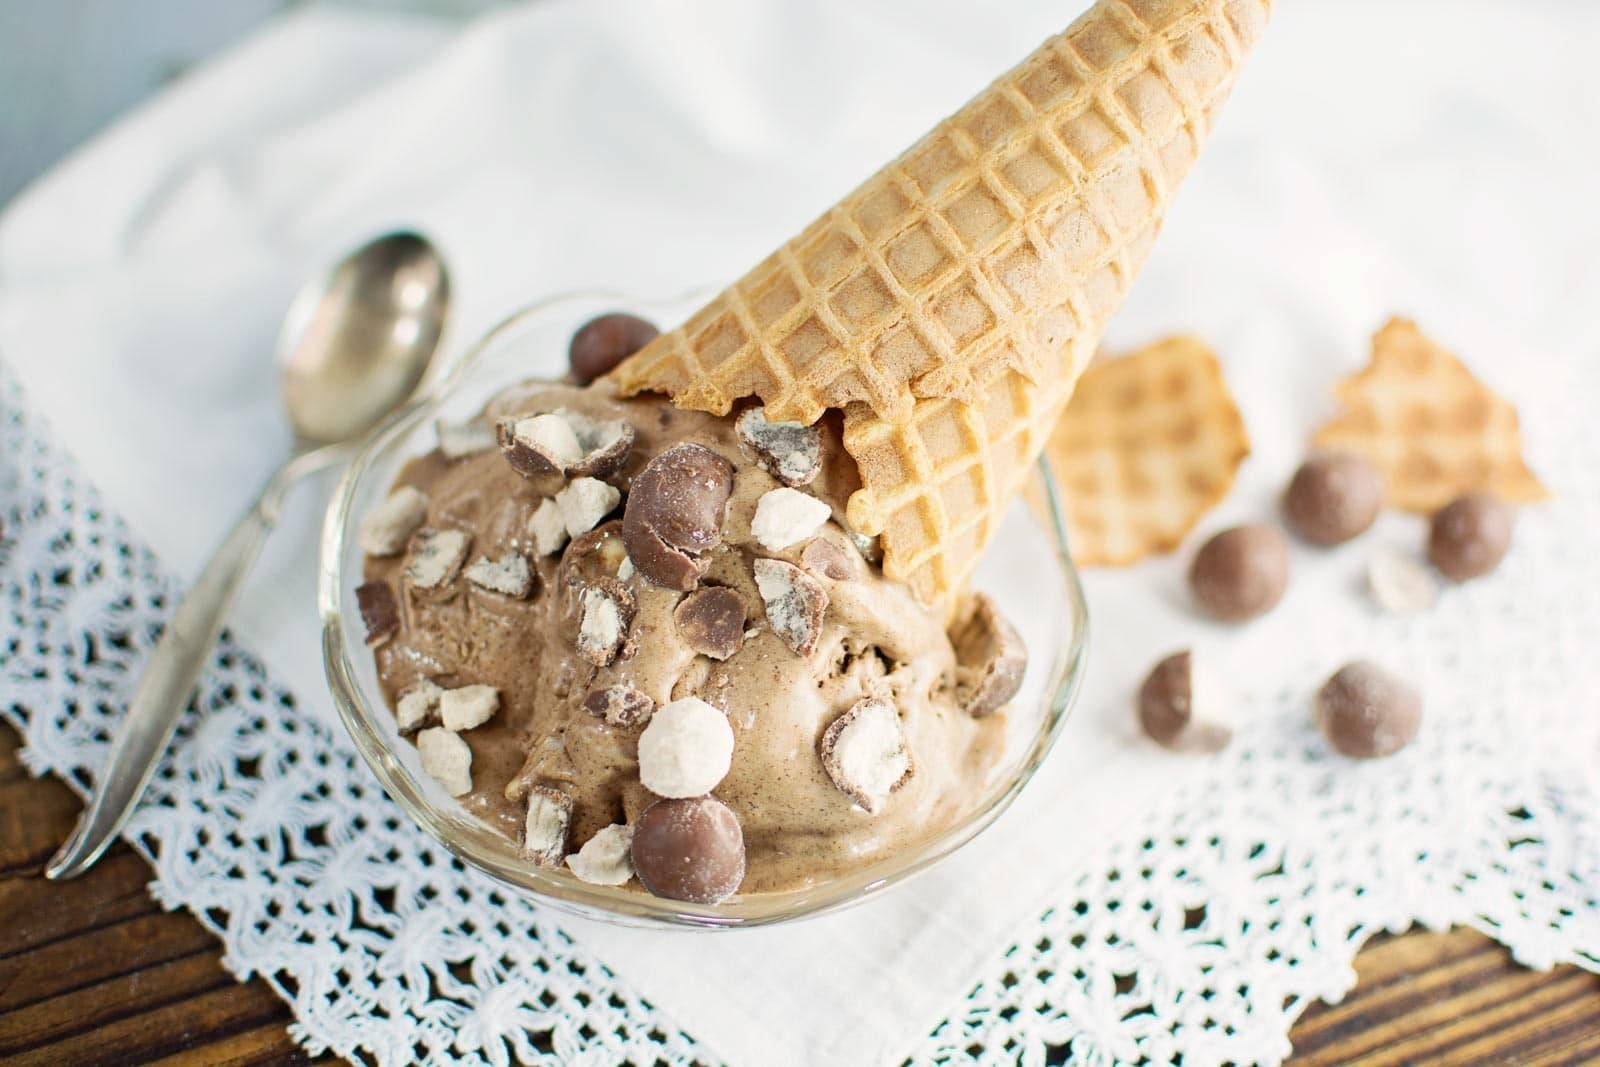 This. Ice. Cream. Chocolate Malt Ice Cream! Find the recipe @LittleFiggyFood